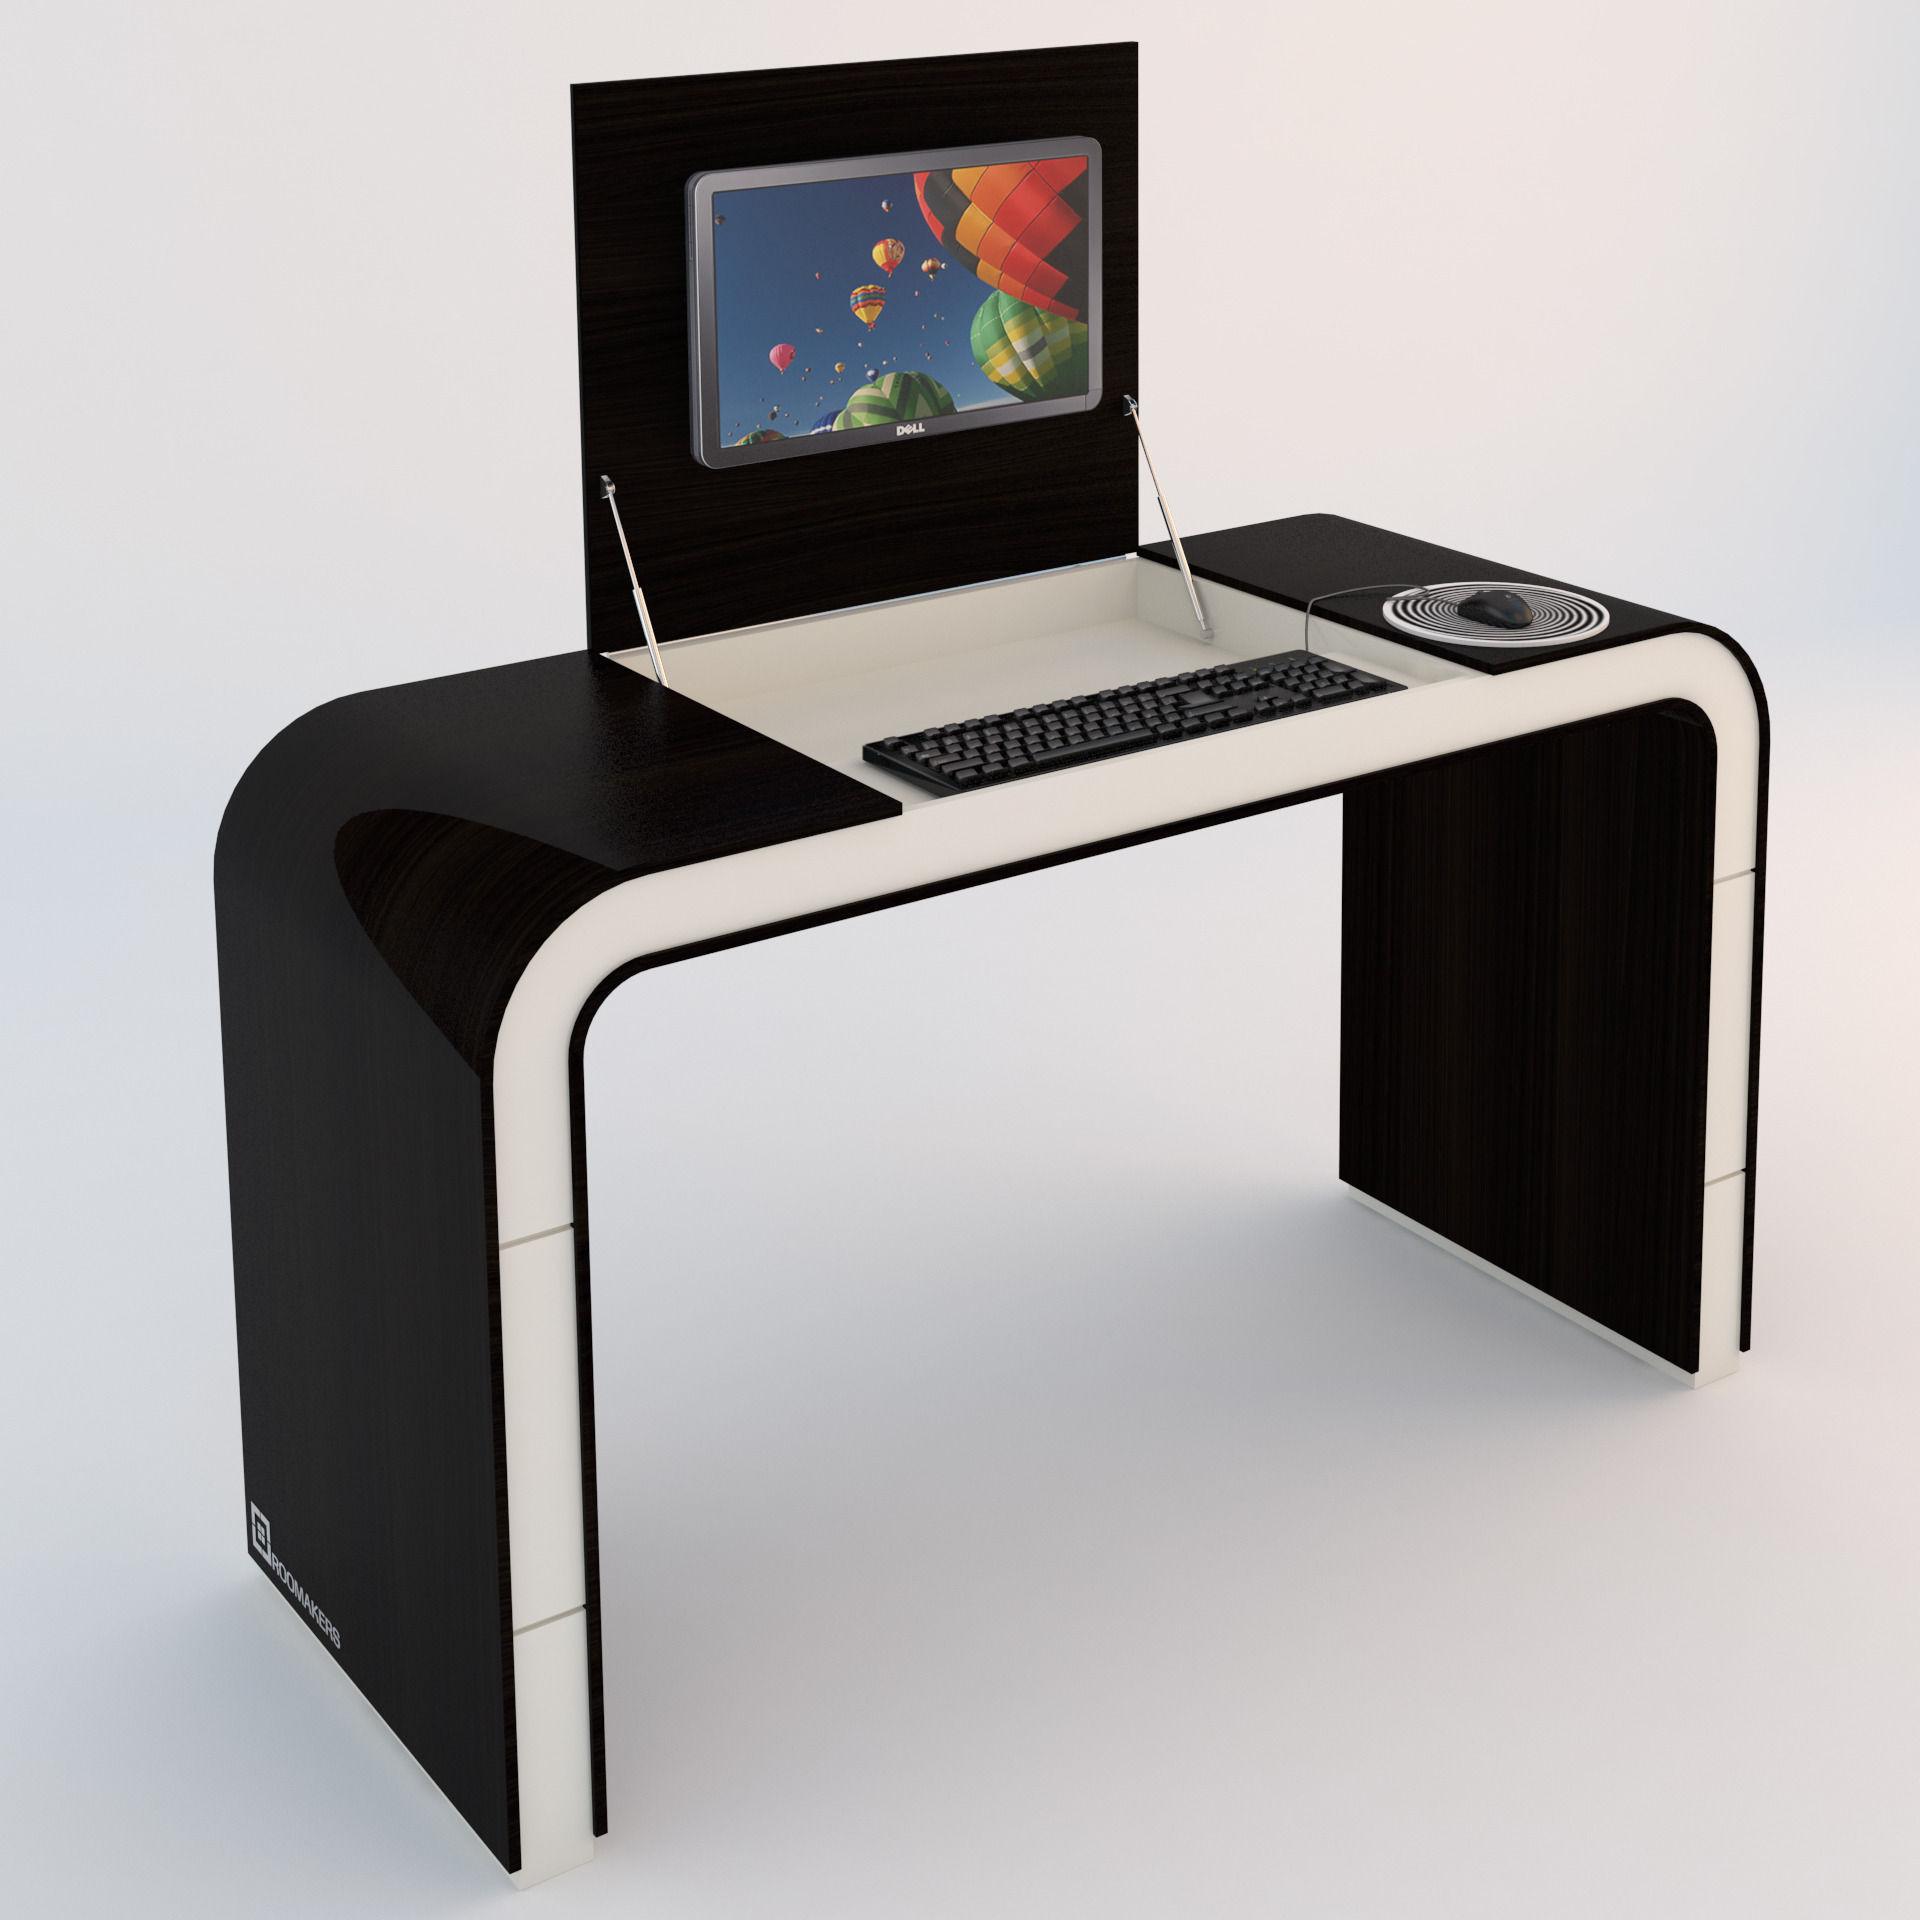 3d model pc table vr ar low poly max obj 3ds. Black Bedroom Furniture Sets. Home Design Ideas